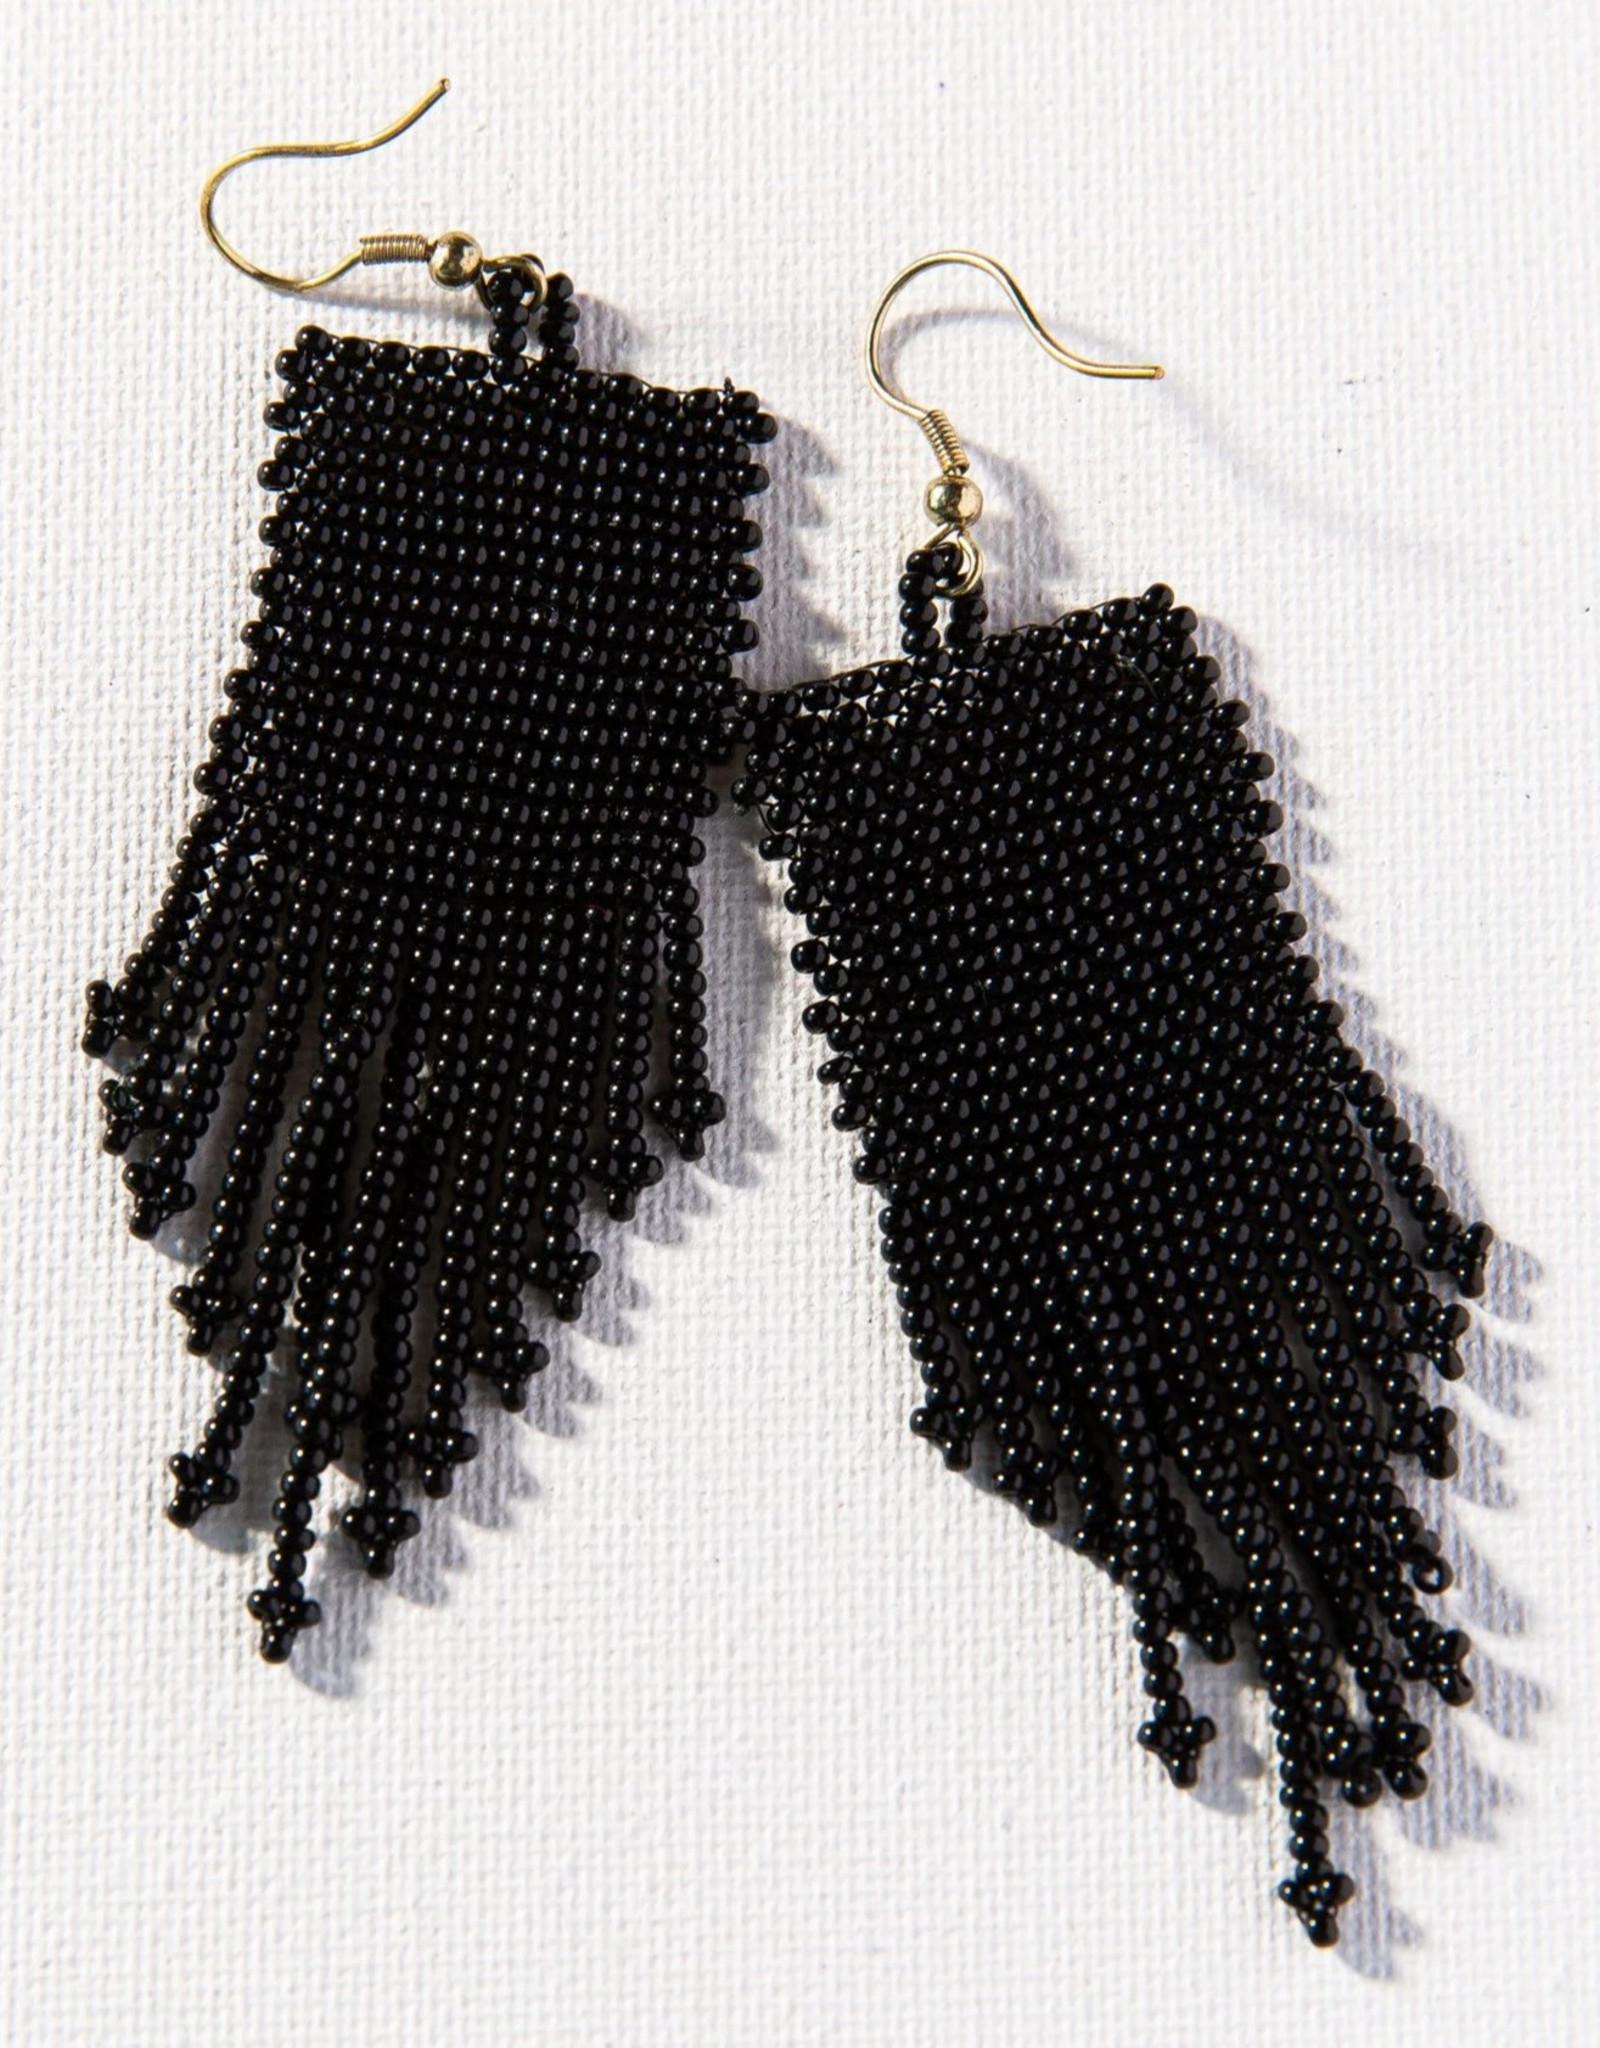 EARRING SEED BEAD 3.75 INCH BLACK